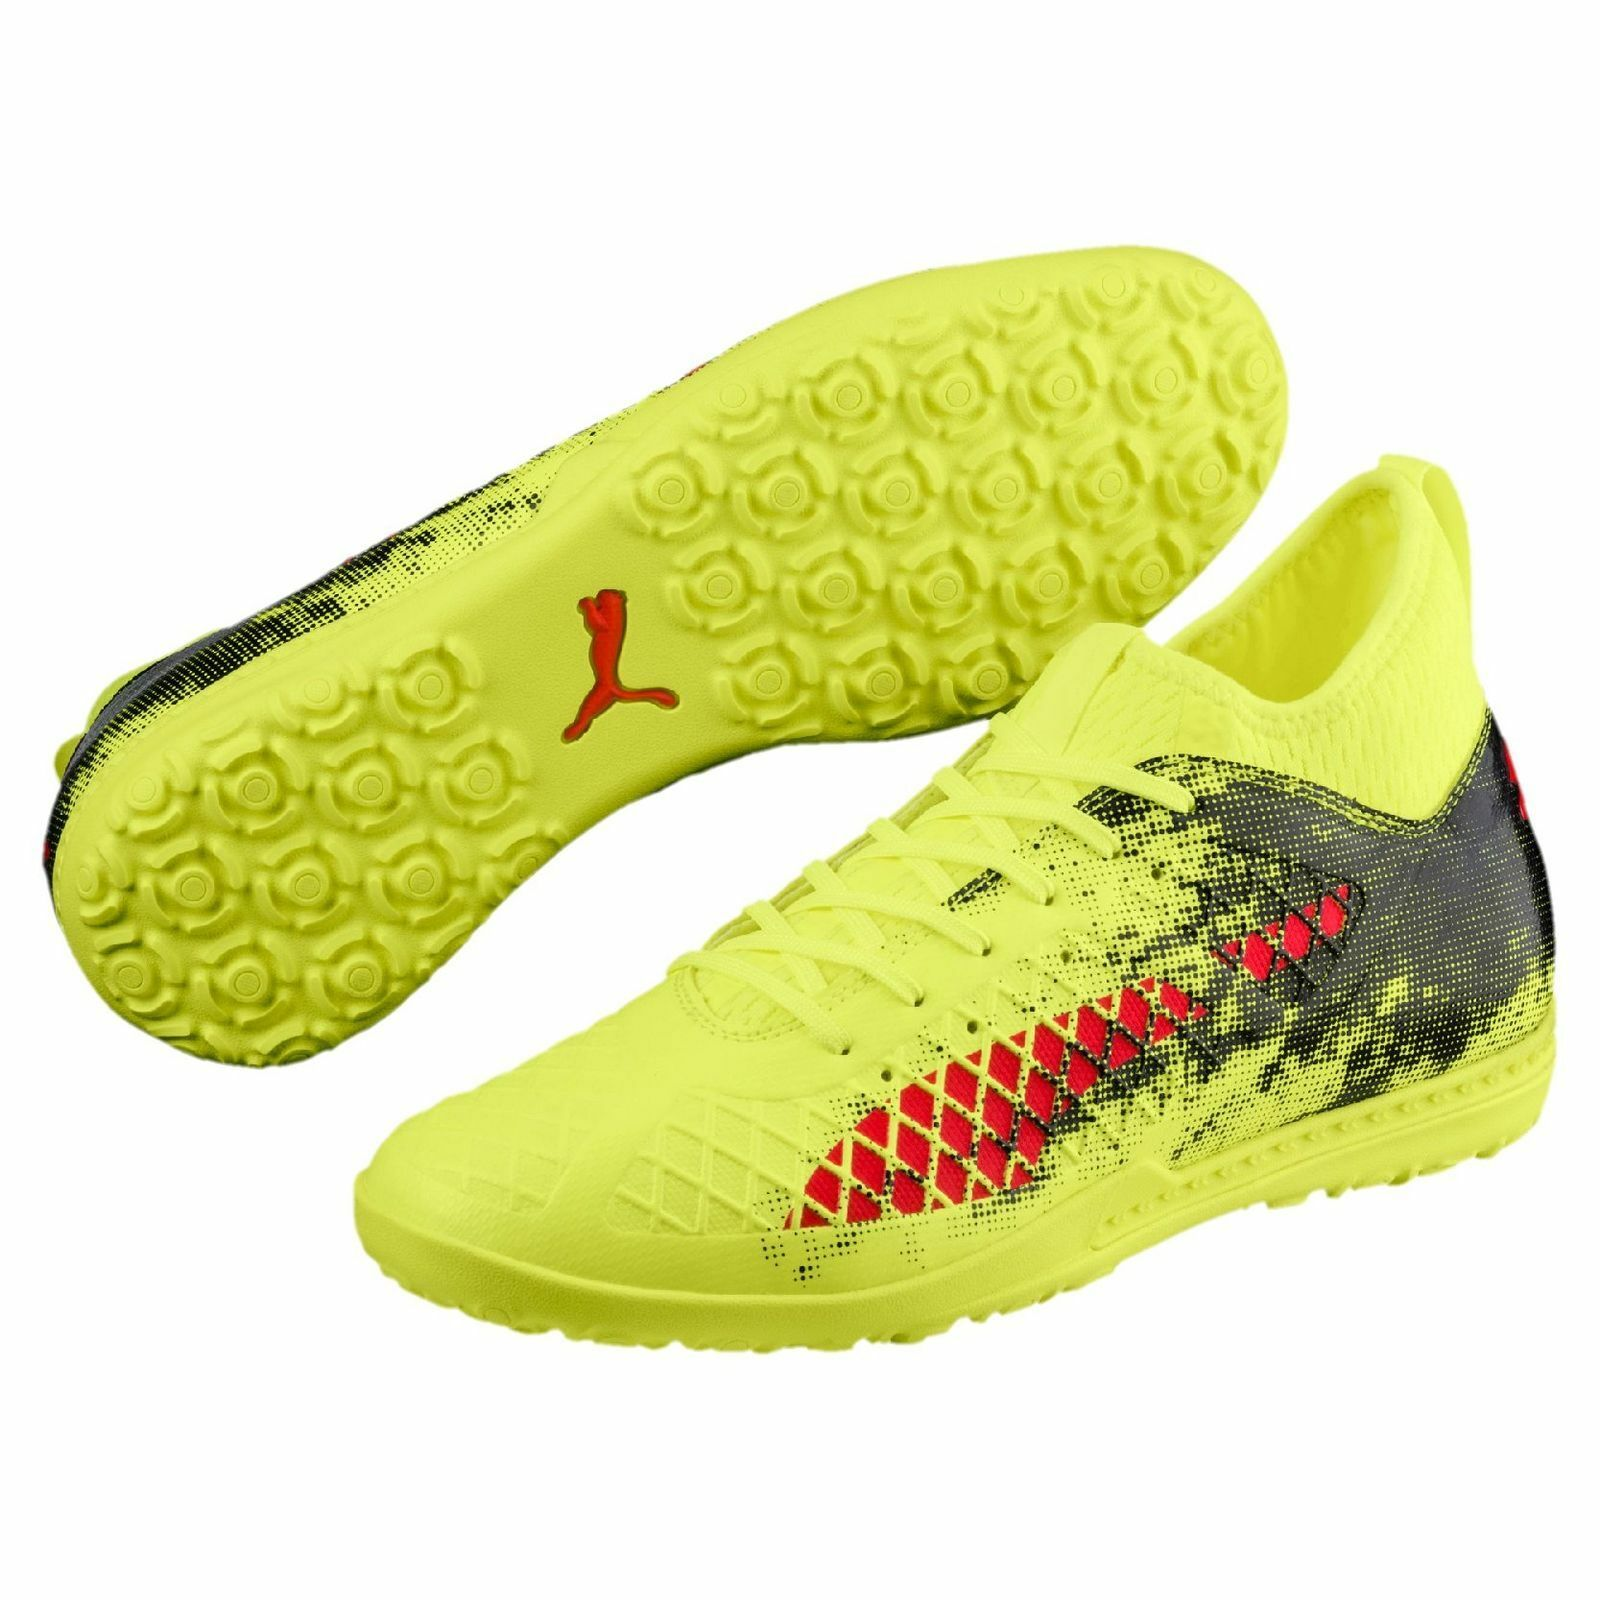 Puma Future 18.3 TT Turf 2018 Soccer Shoes Brand New Yellow / Red / Black